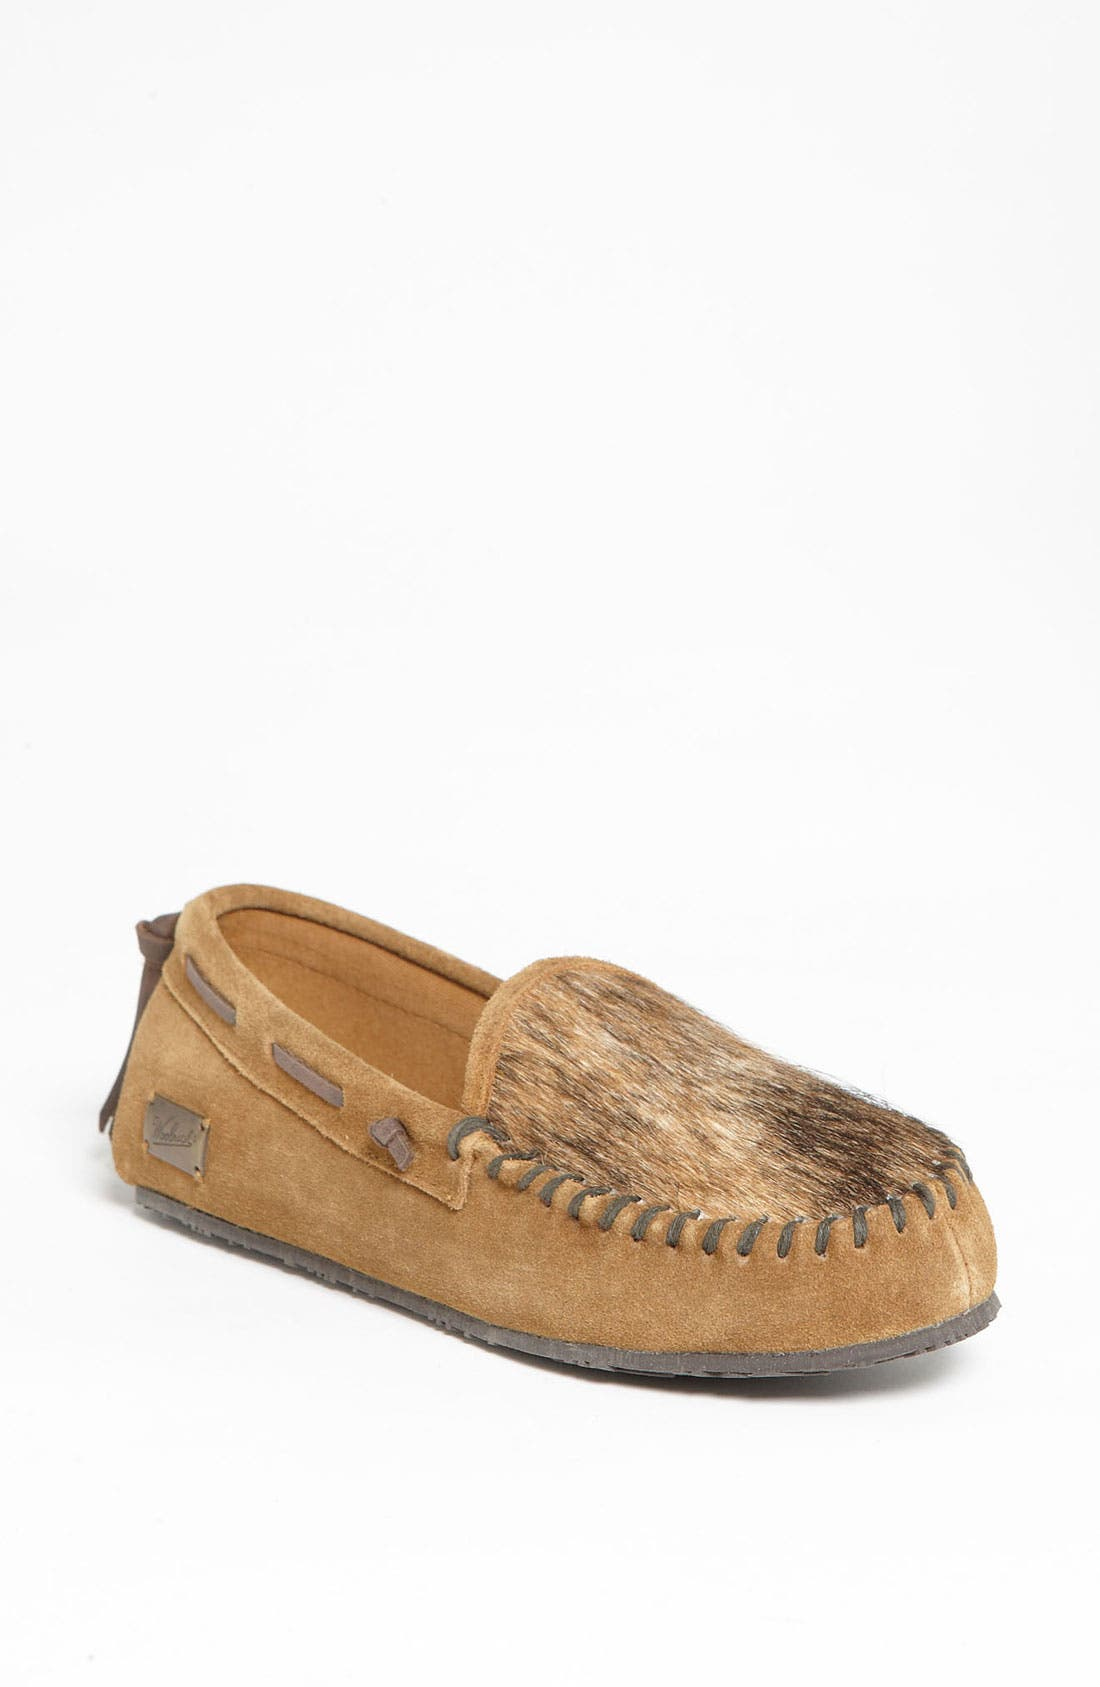 Main Image - Woolrich 'Tillamook' Moccasin Slipper